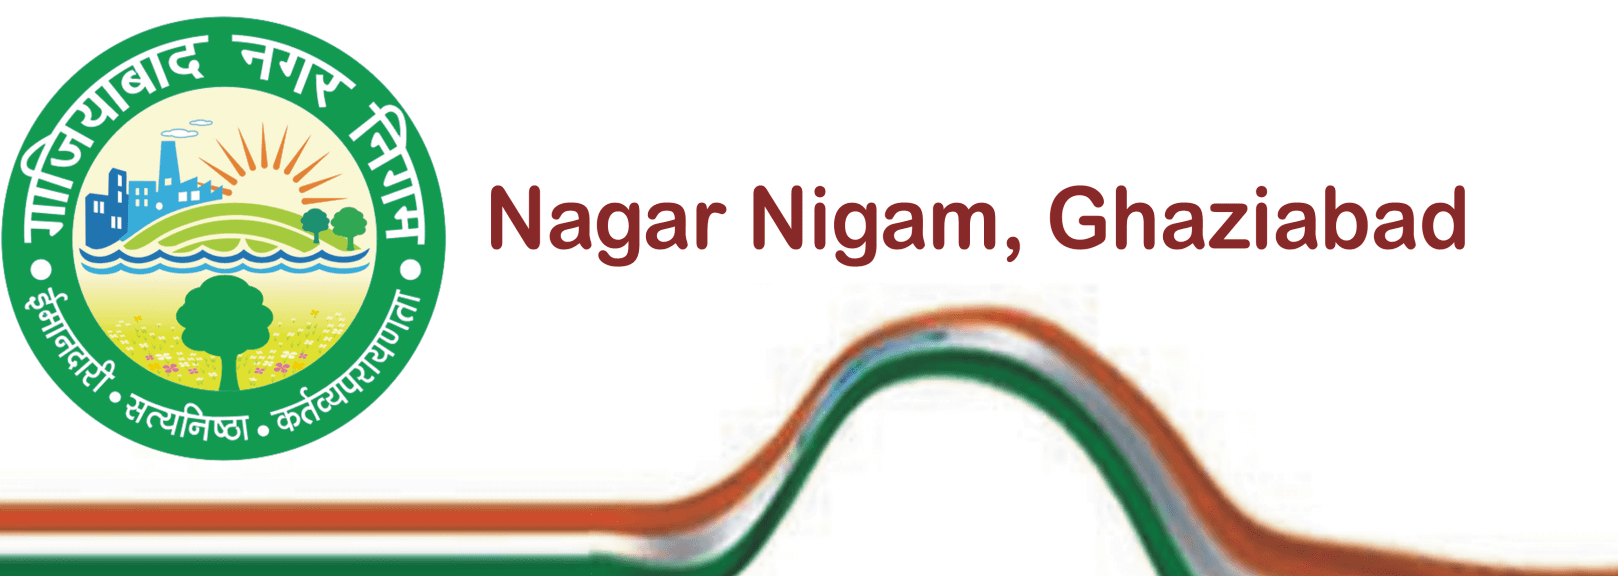 Nagar Nigam Ghaziabad